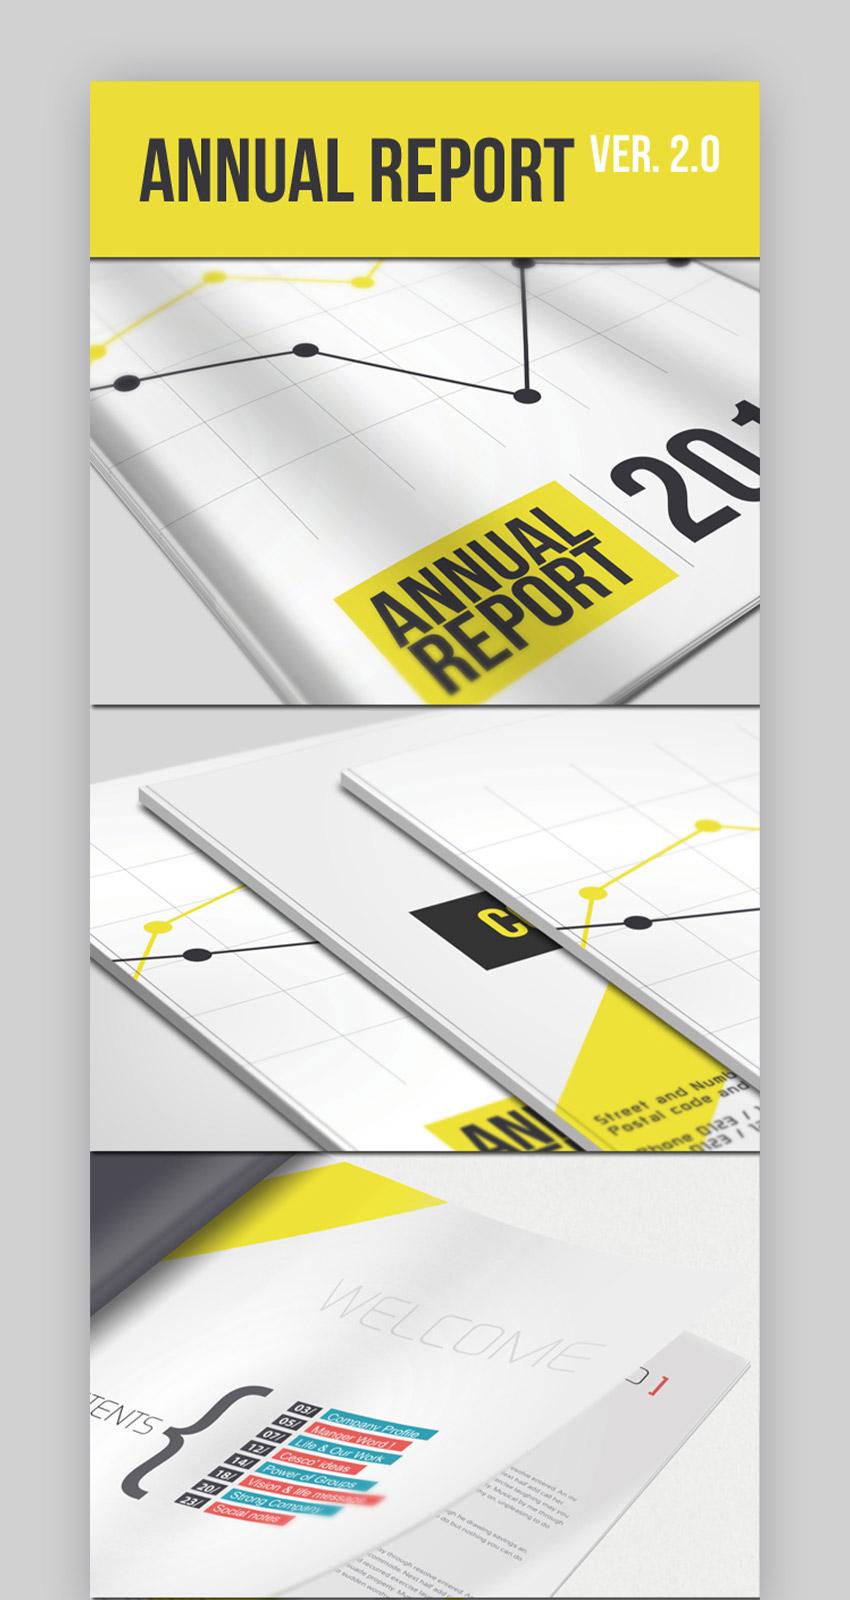 Annual Report Brochure Ver 20